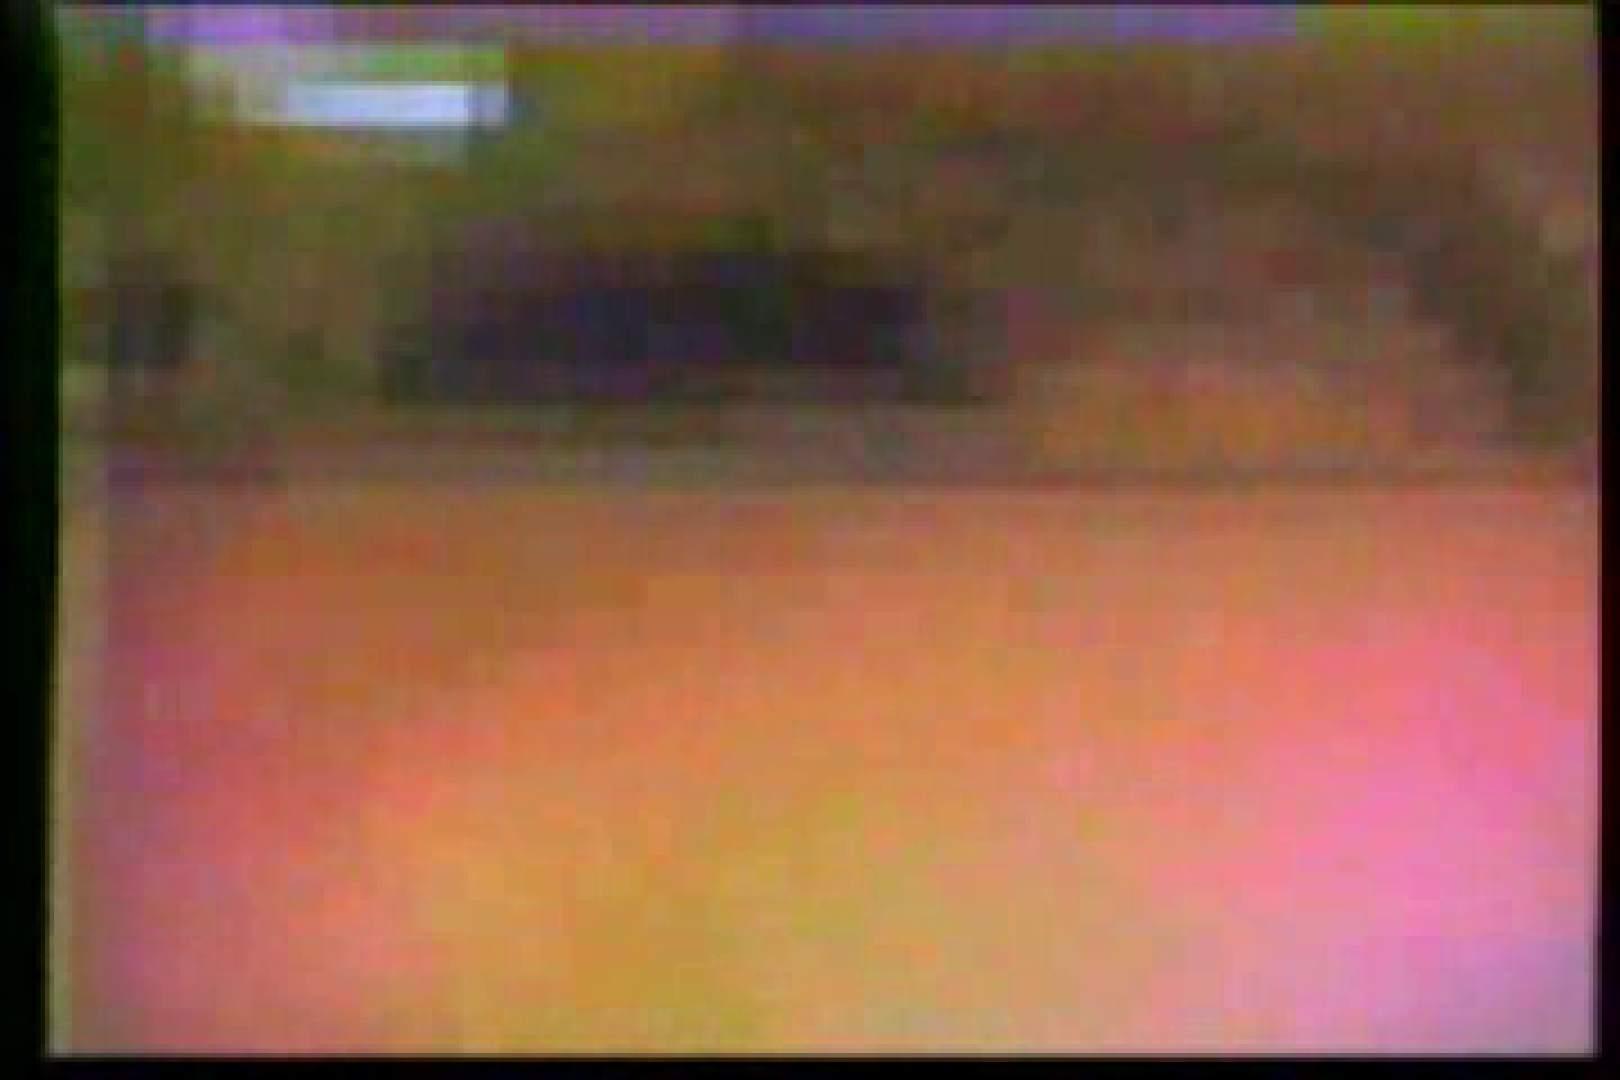 Nostalgic various fucks.vol.04 ゲイのオナニー映像 ゲイセックス画像 102枚 14